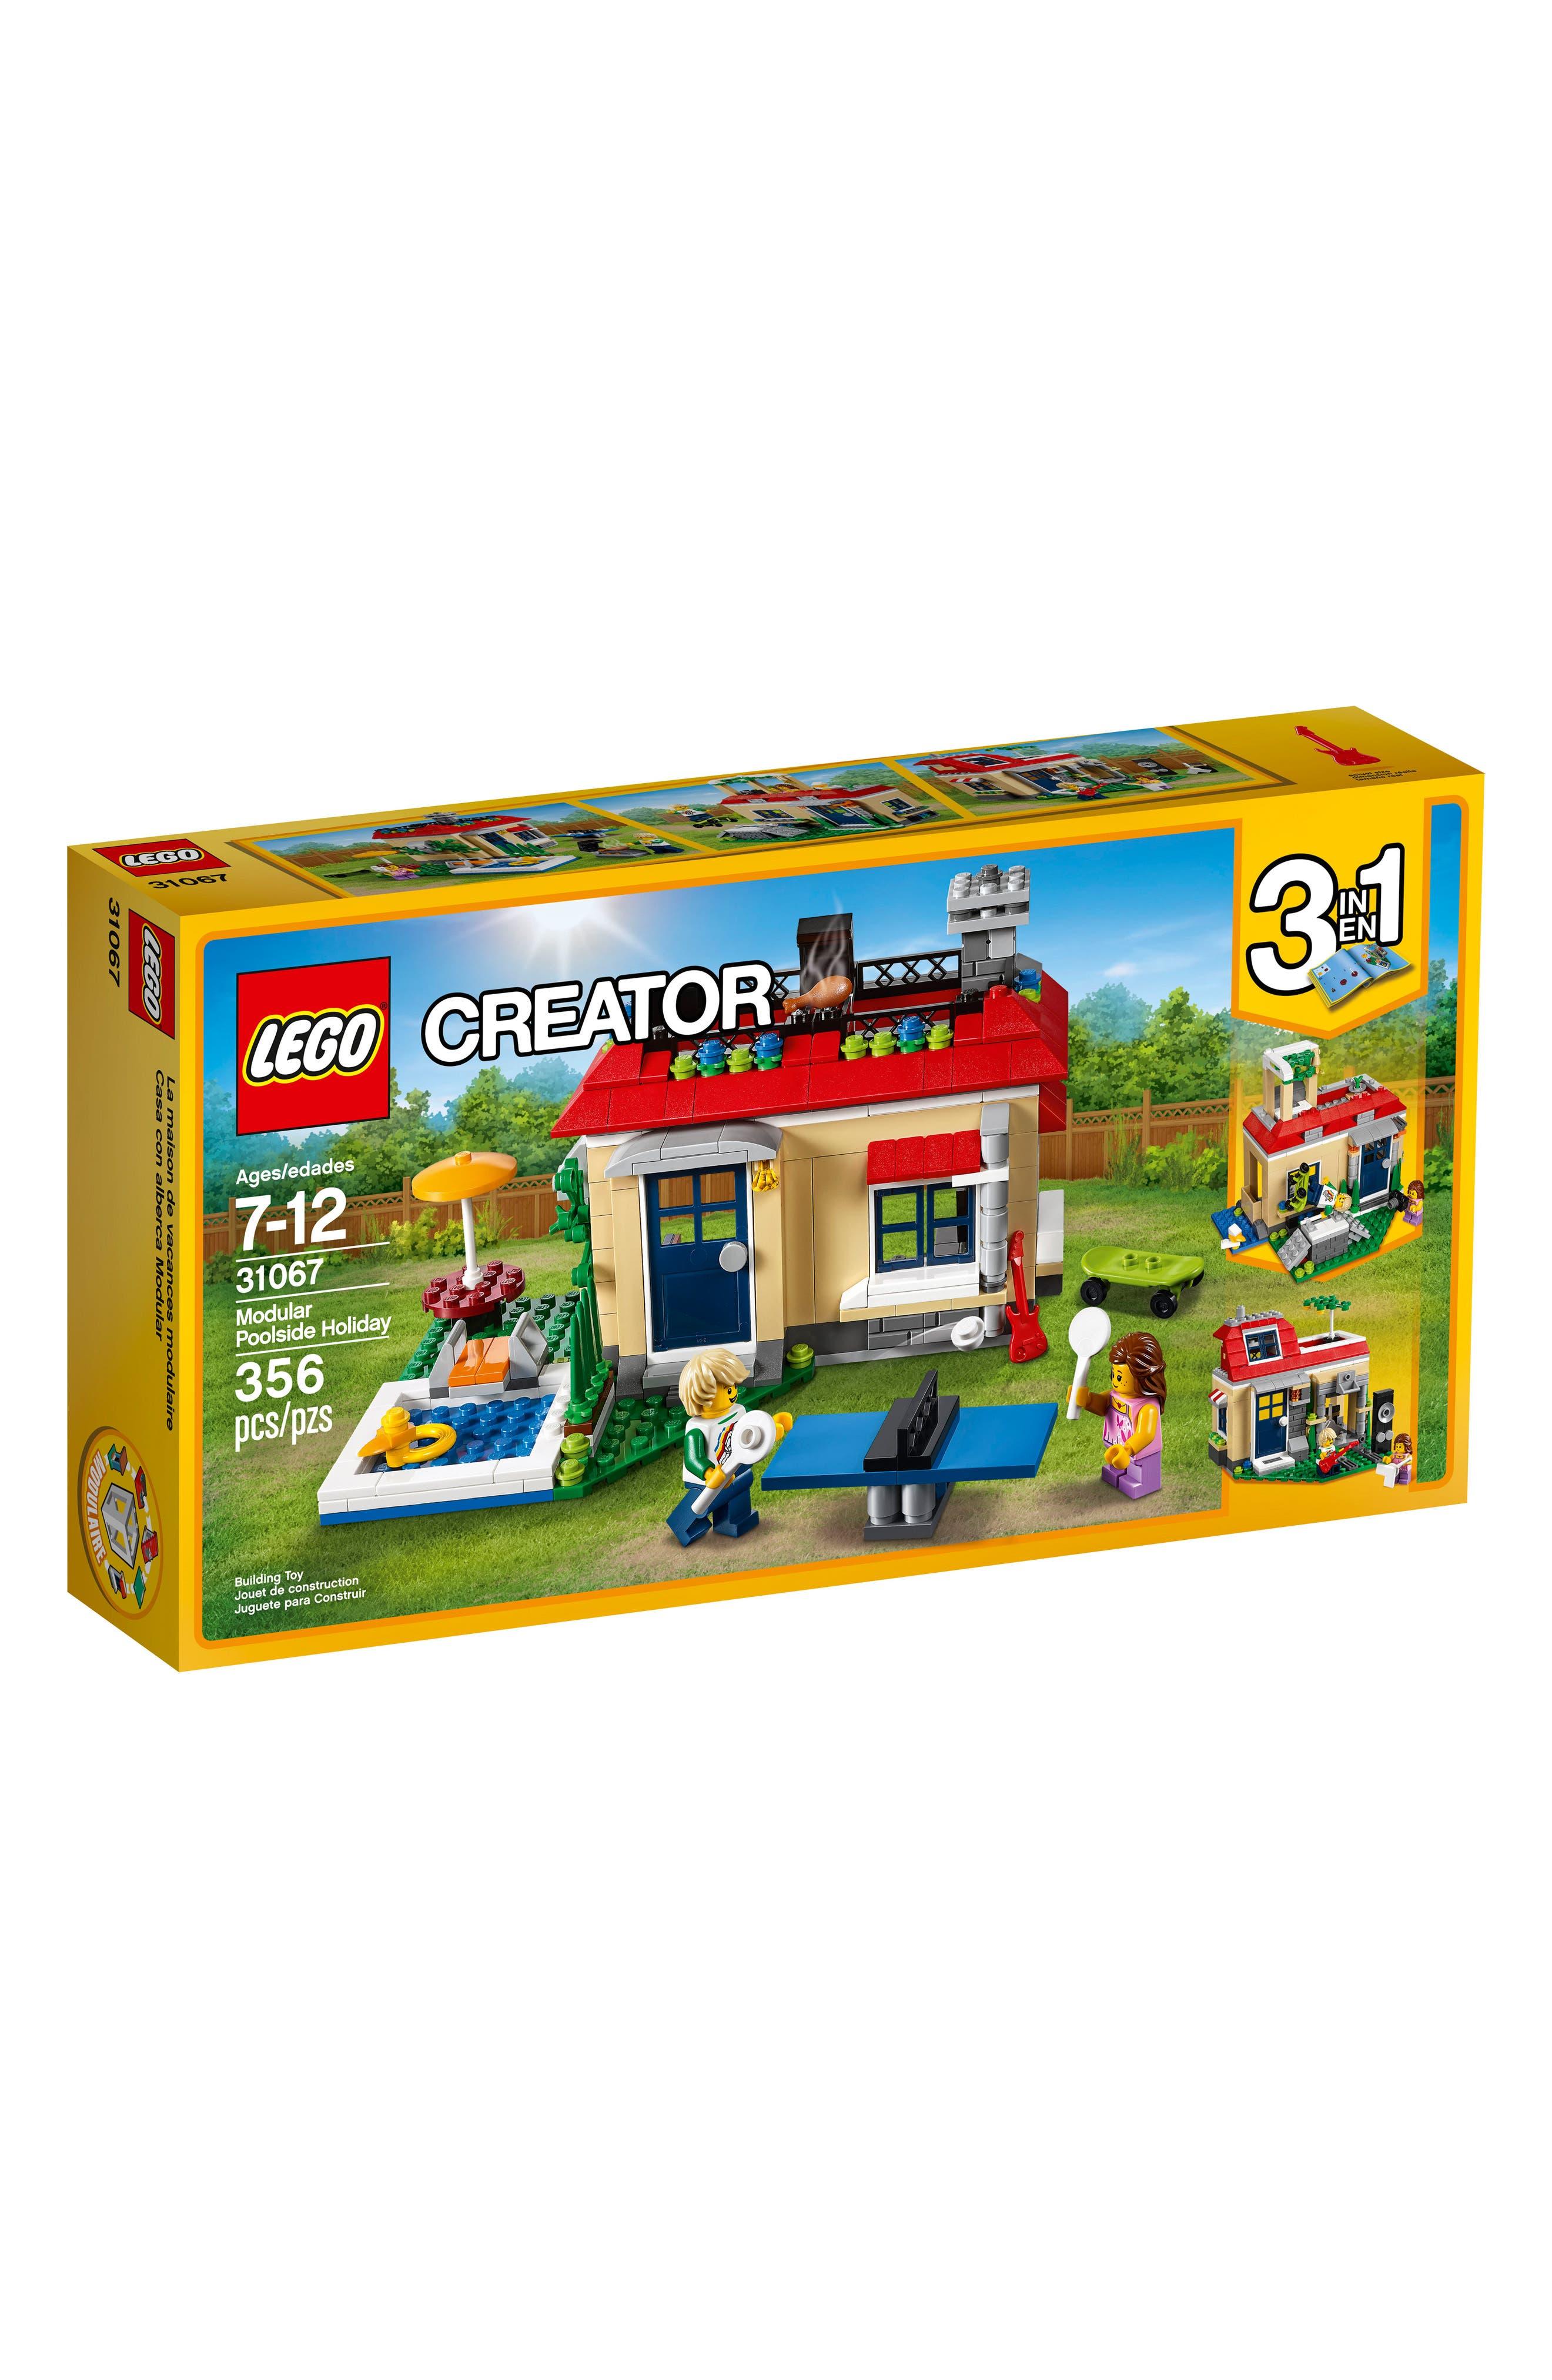 LEGO® Creator 3-in-1 Modular Poolside Holiday Play Set - 31067